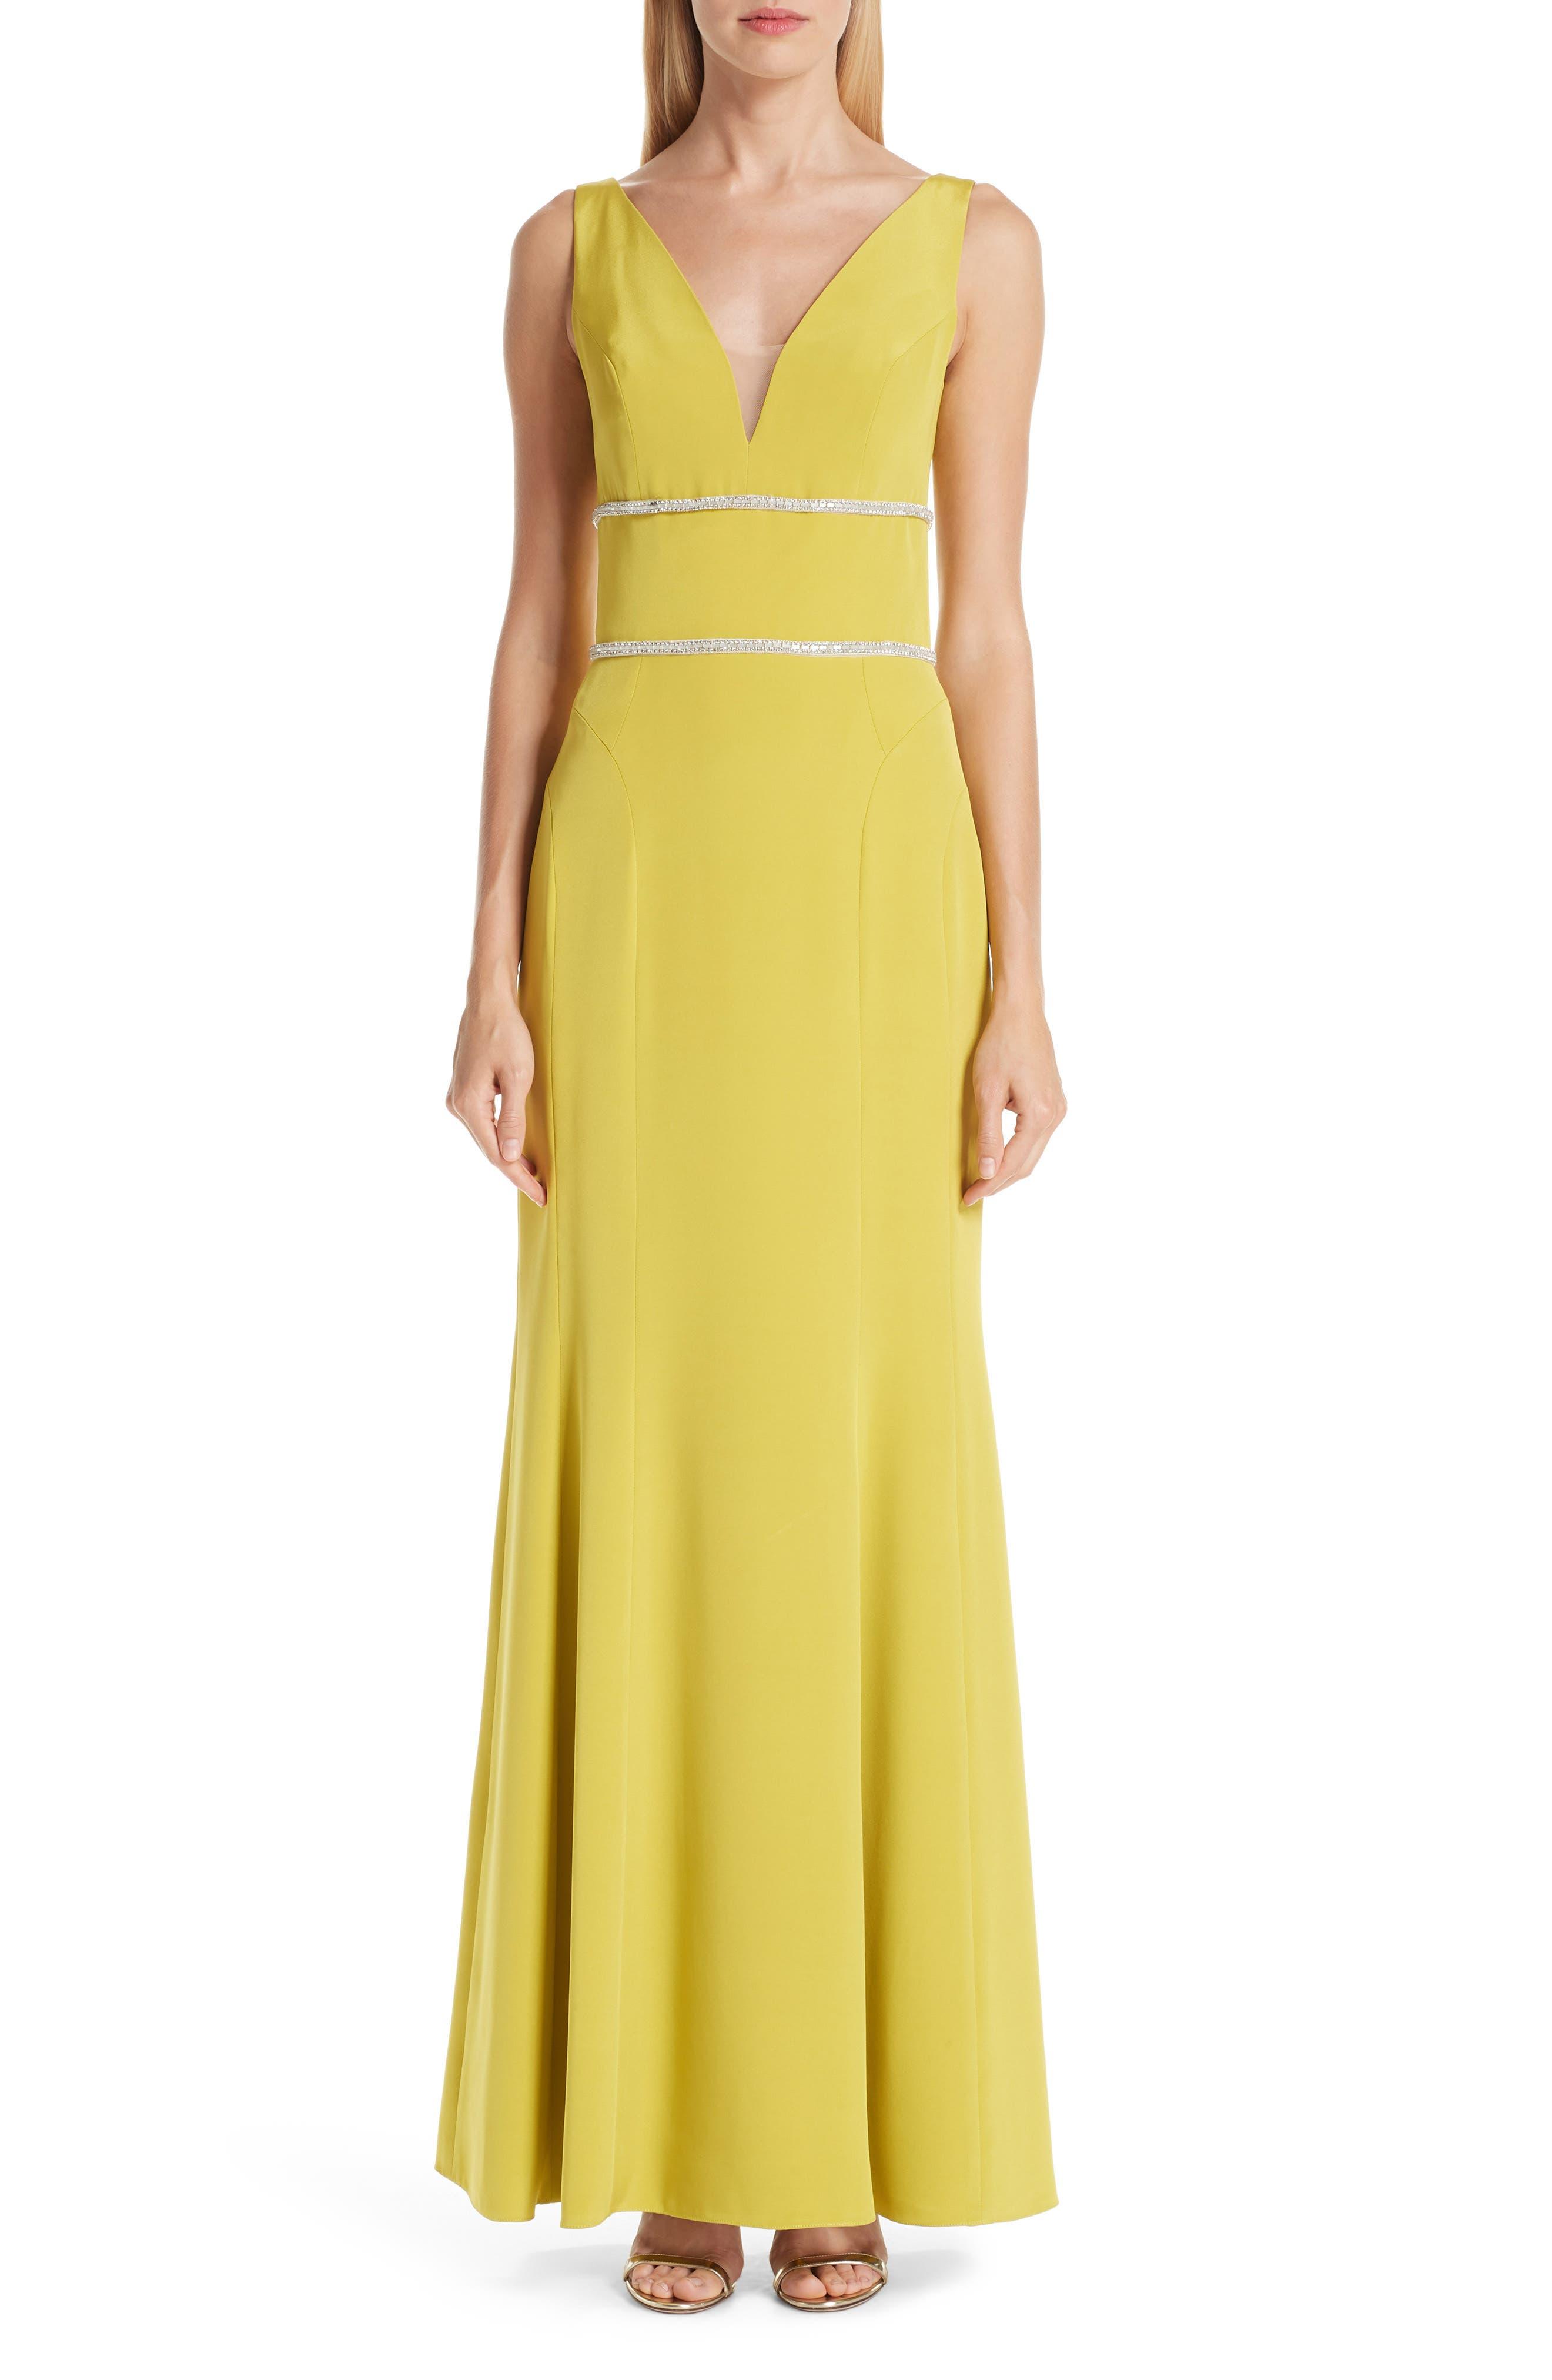 VERDIN,                             Embellished Silk V-Neck Evening Dress,                             Main thumbnail 1, color,                             CITRUS